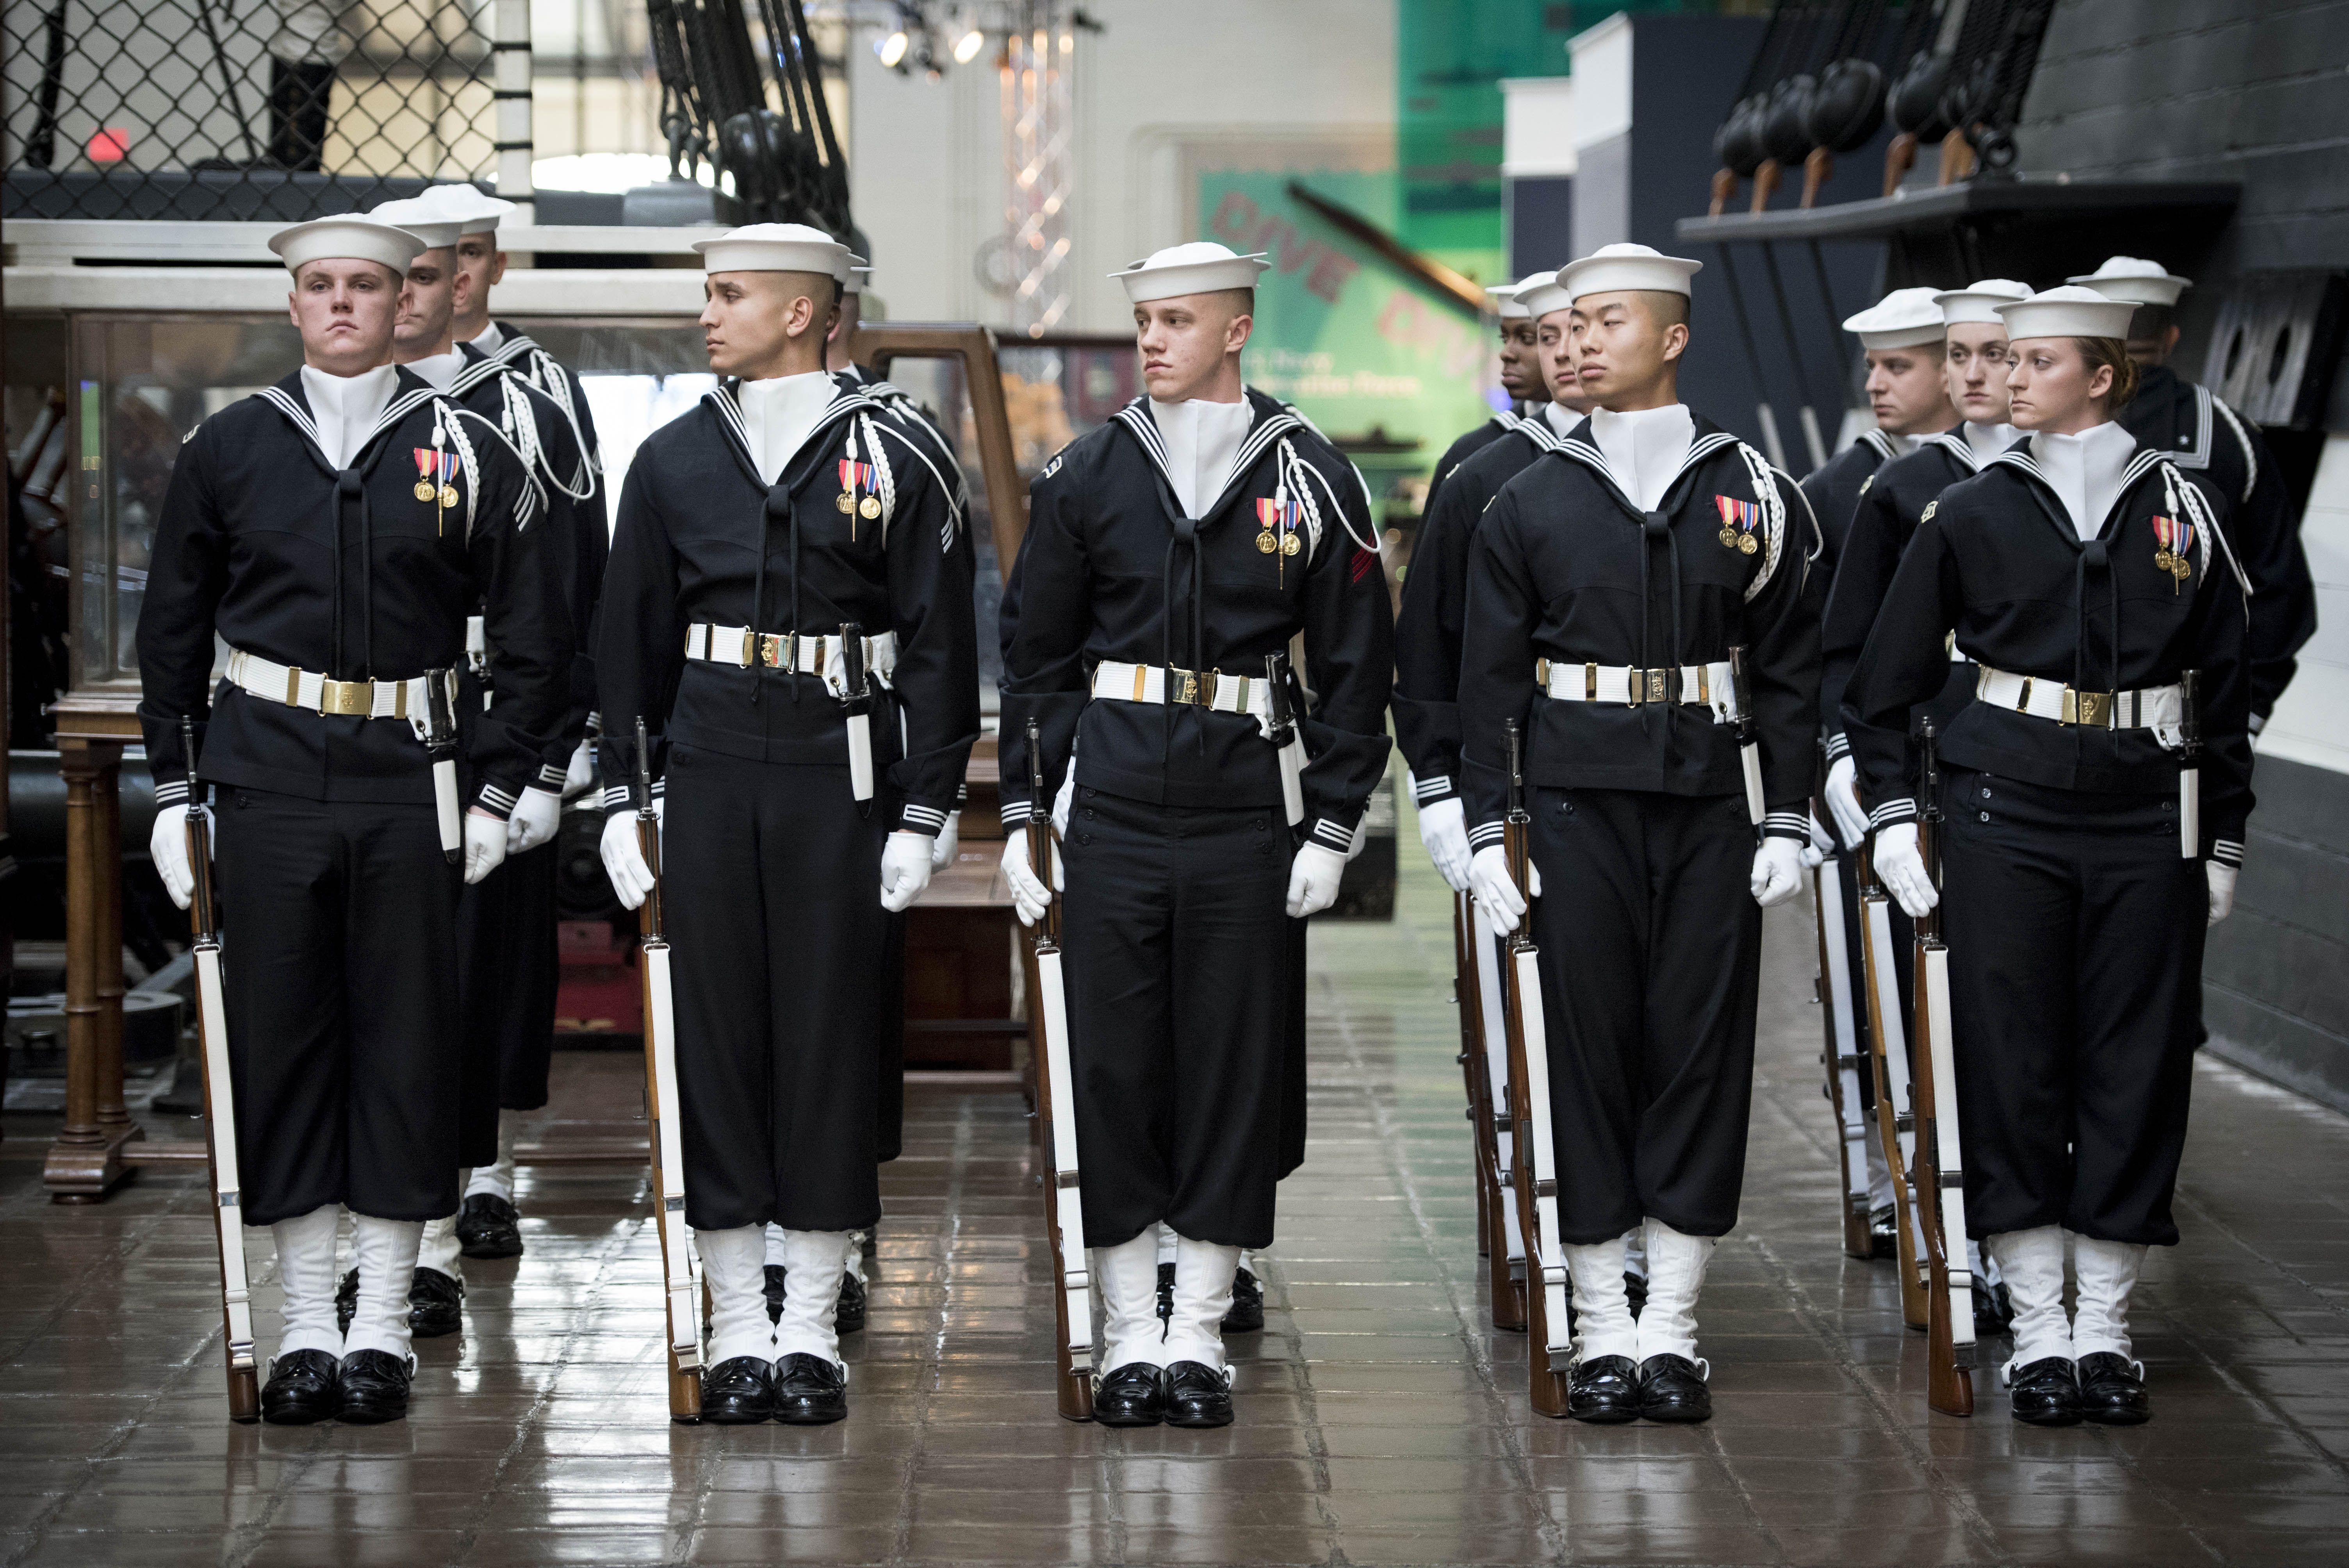 Ceremonial Guard Us Navy Pinterest - Us-navy-ceremonial-guard